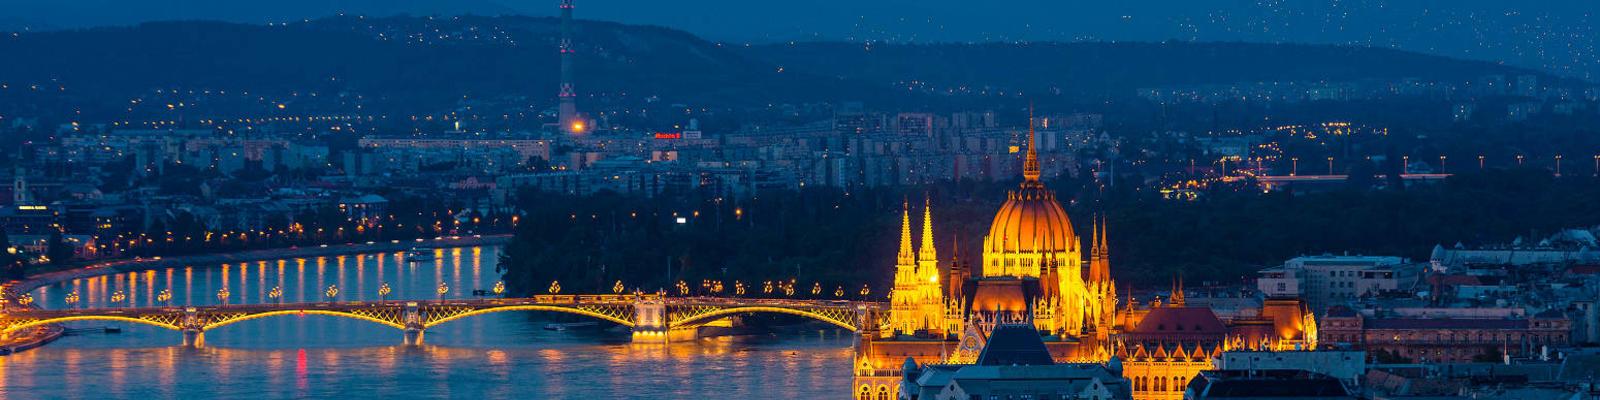 Budapest by night.